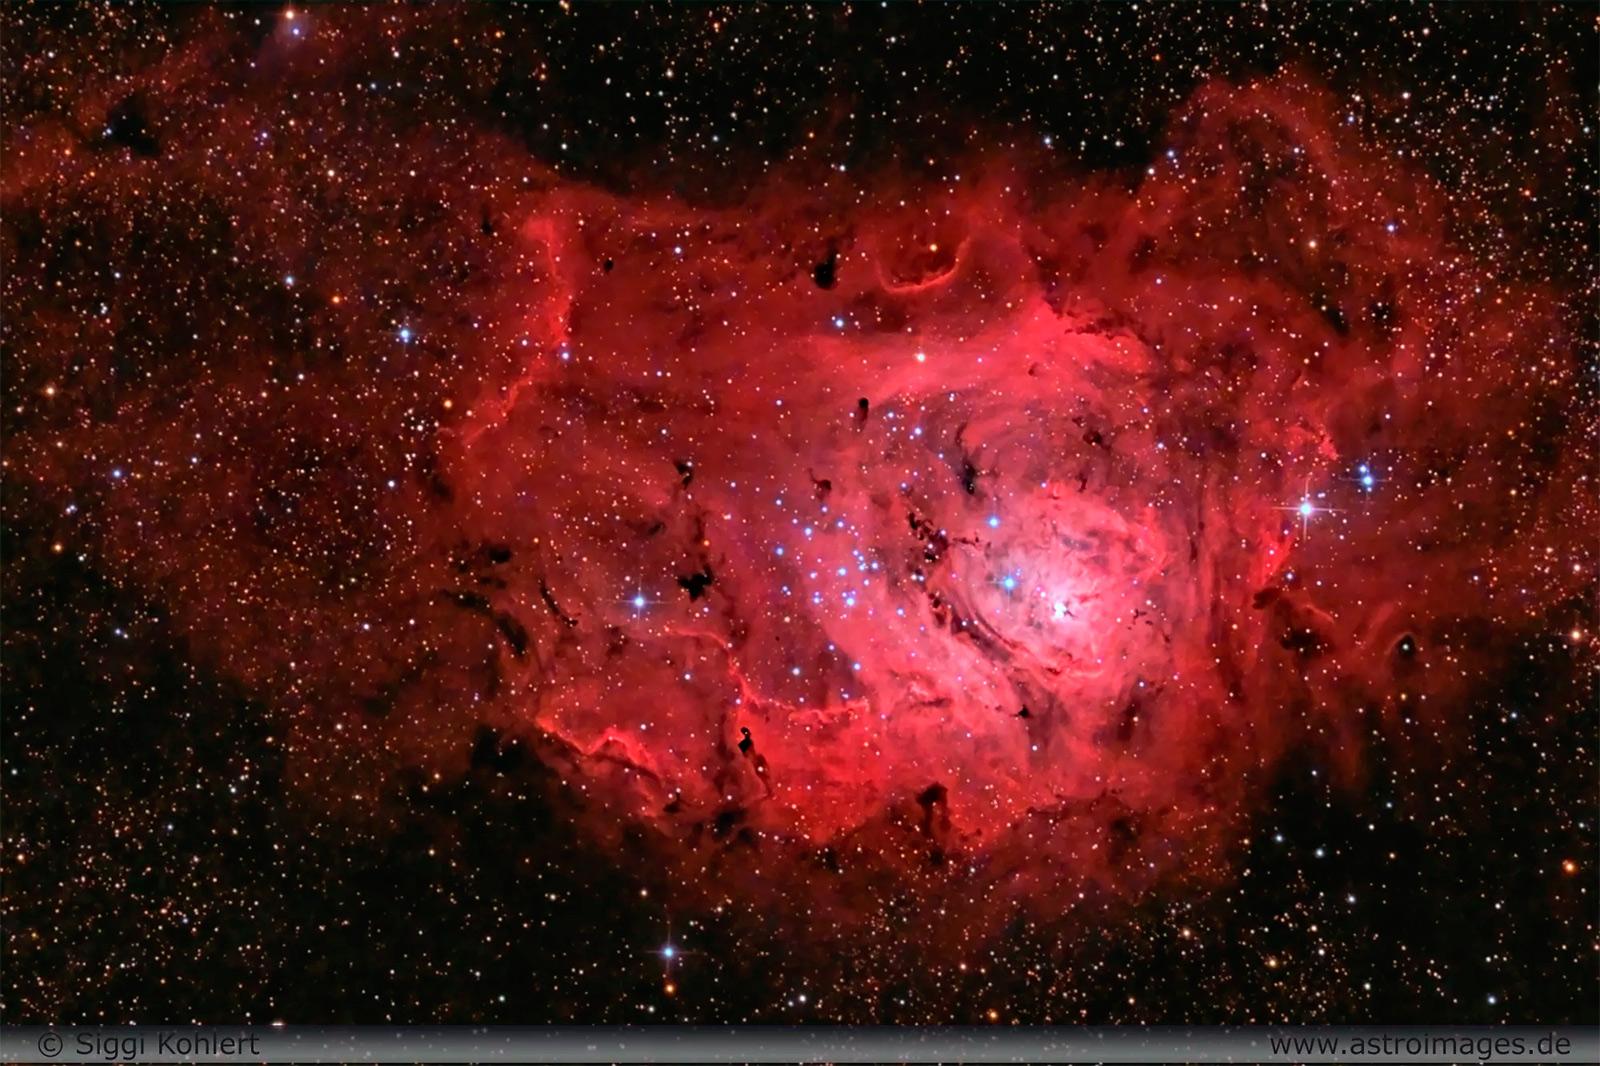 пример темной туманности - М8 лагуна